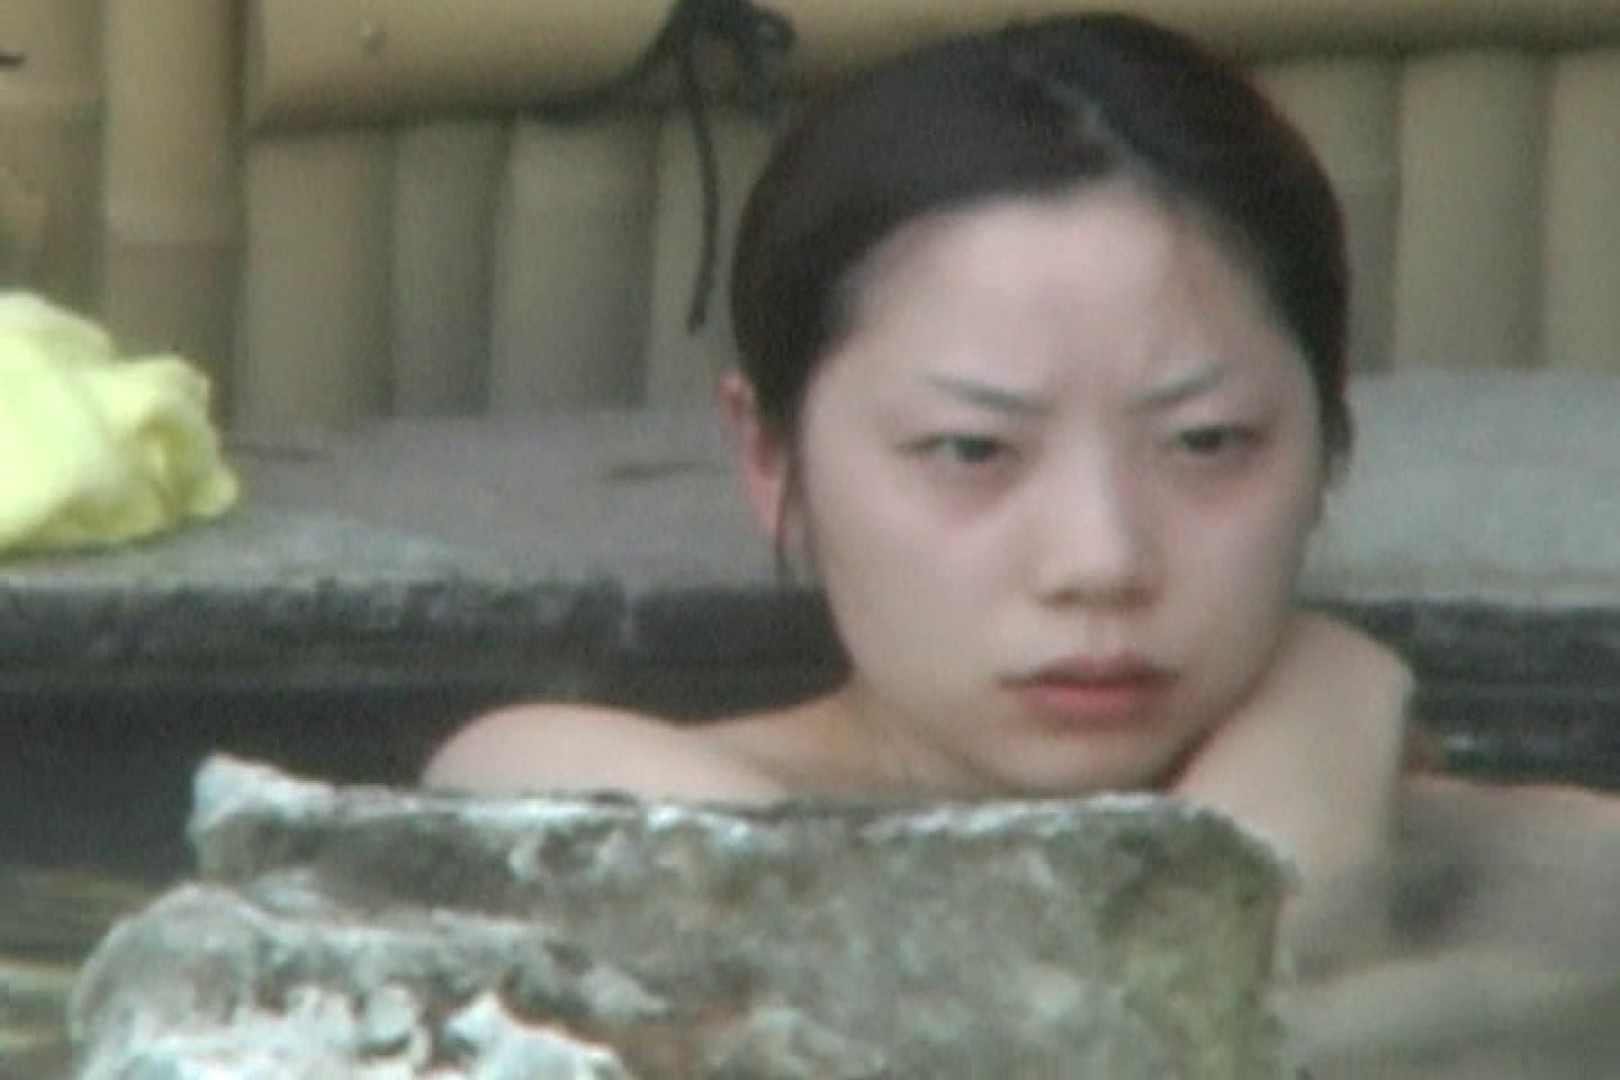 Aquaな露天風呂Vol.596 露天 覗きおまんこ画像 77画像 77